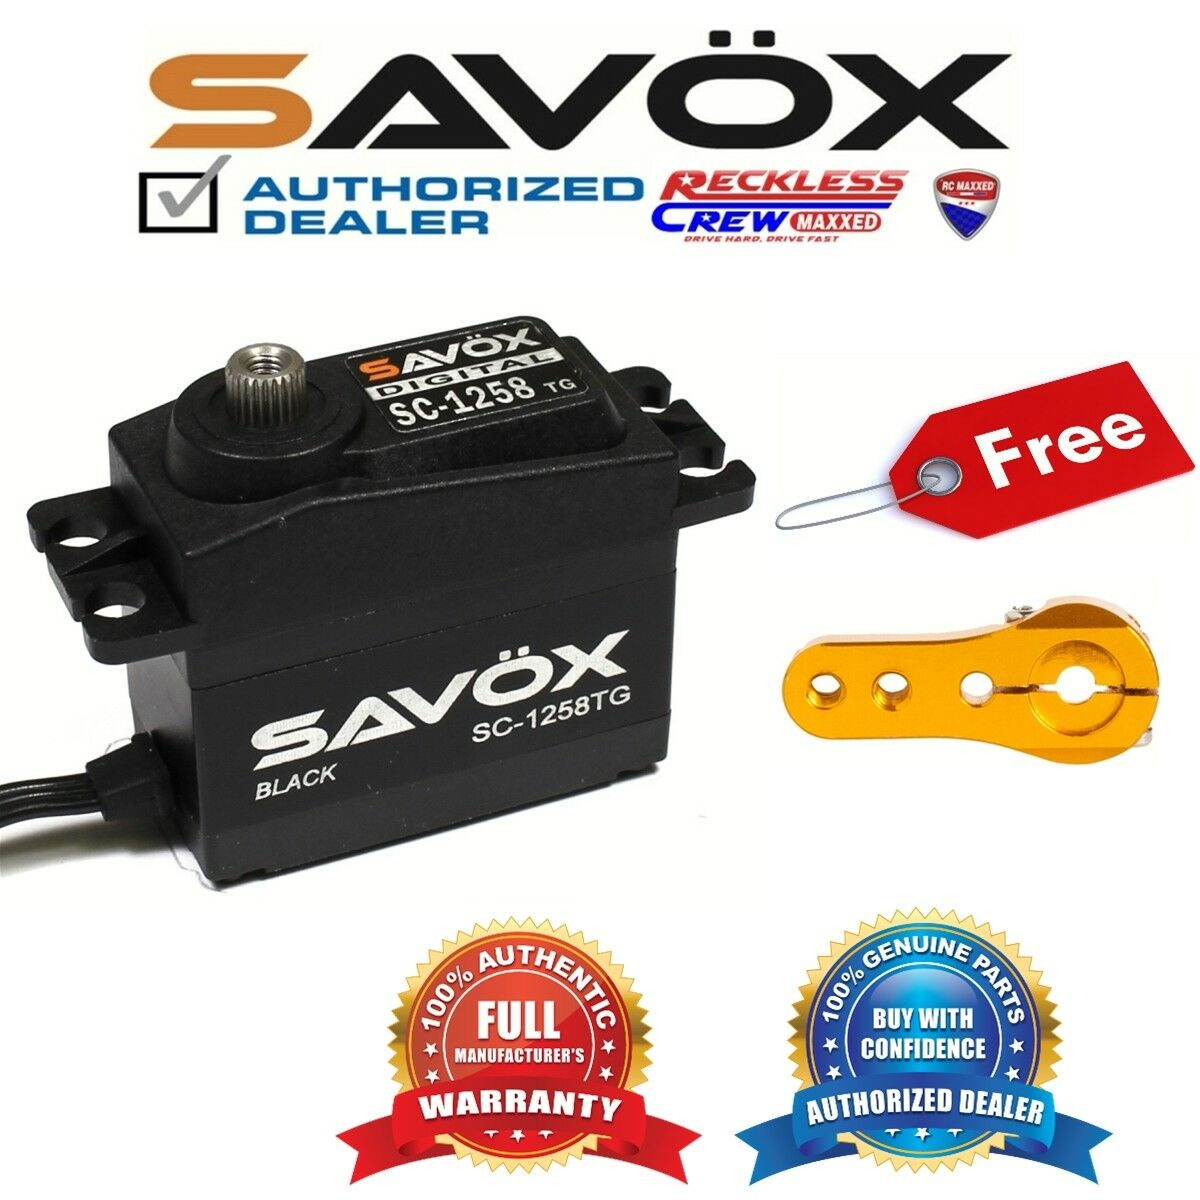 Savox SC-1258TG-BE Digital Servo Coreless Negro + Gratis Aluminio Servo Cuerno de oro